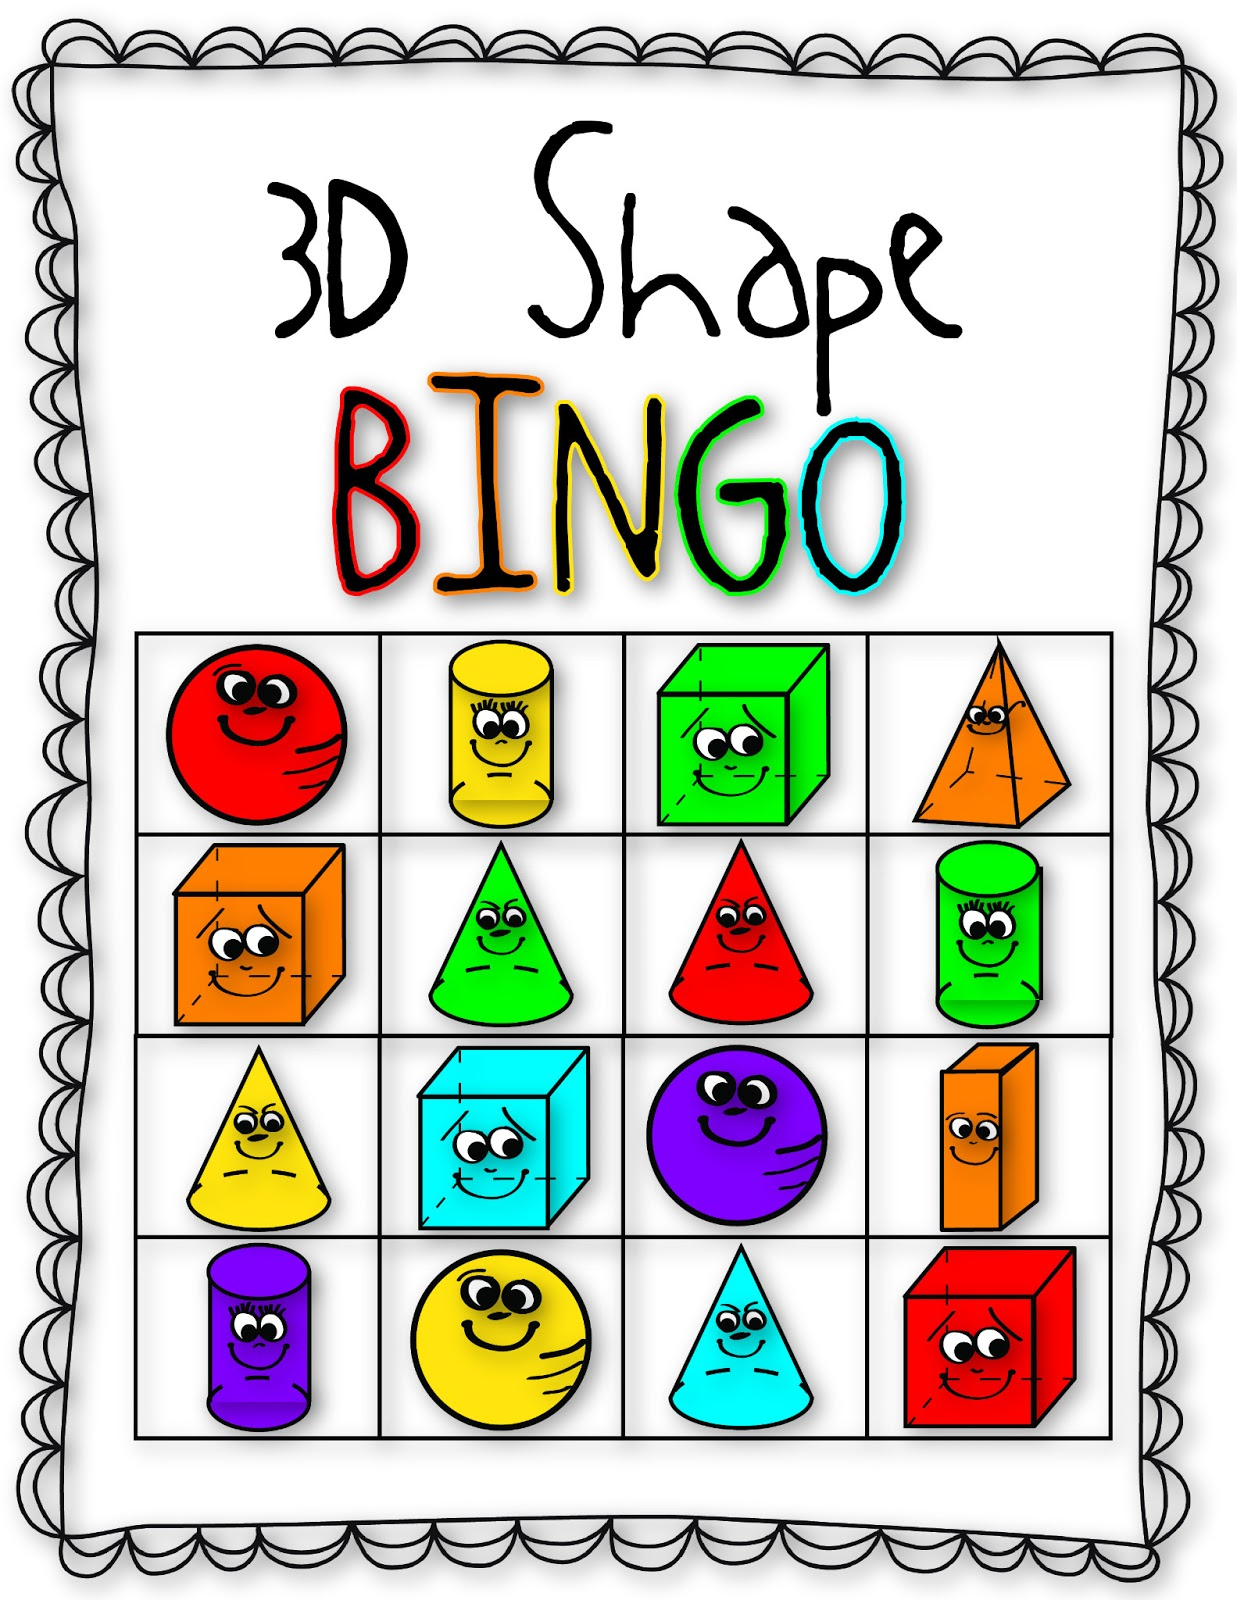 26 Images Of Shape Bingo Template | Bfegy - 3D Shape Bingo Free Printable